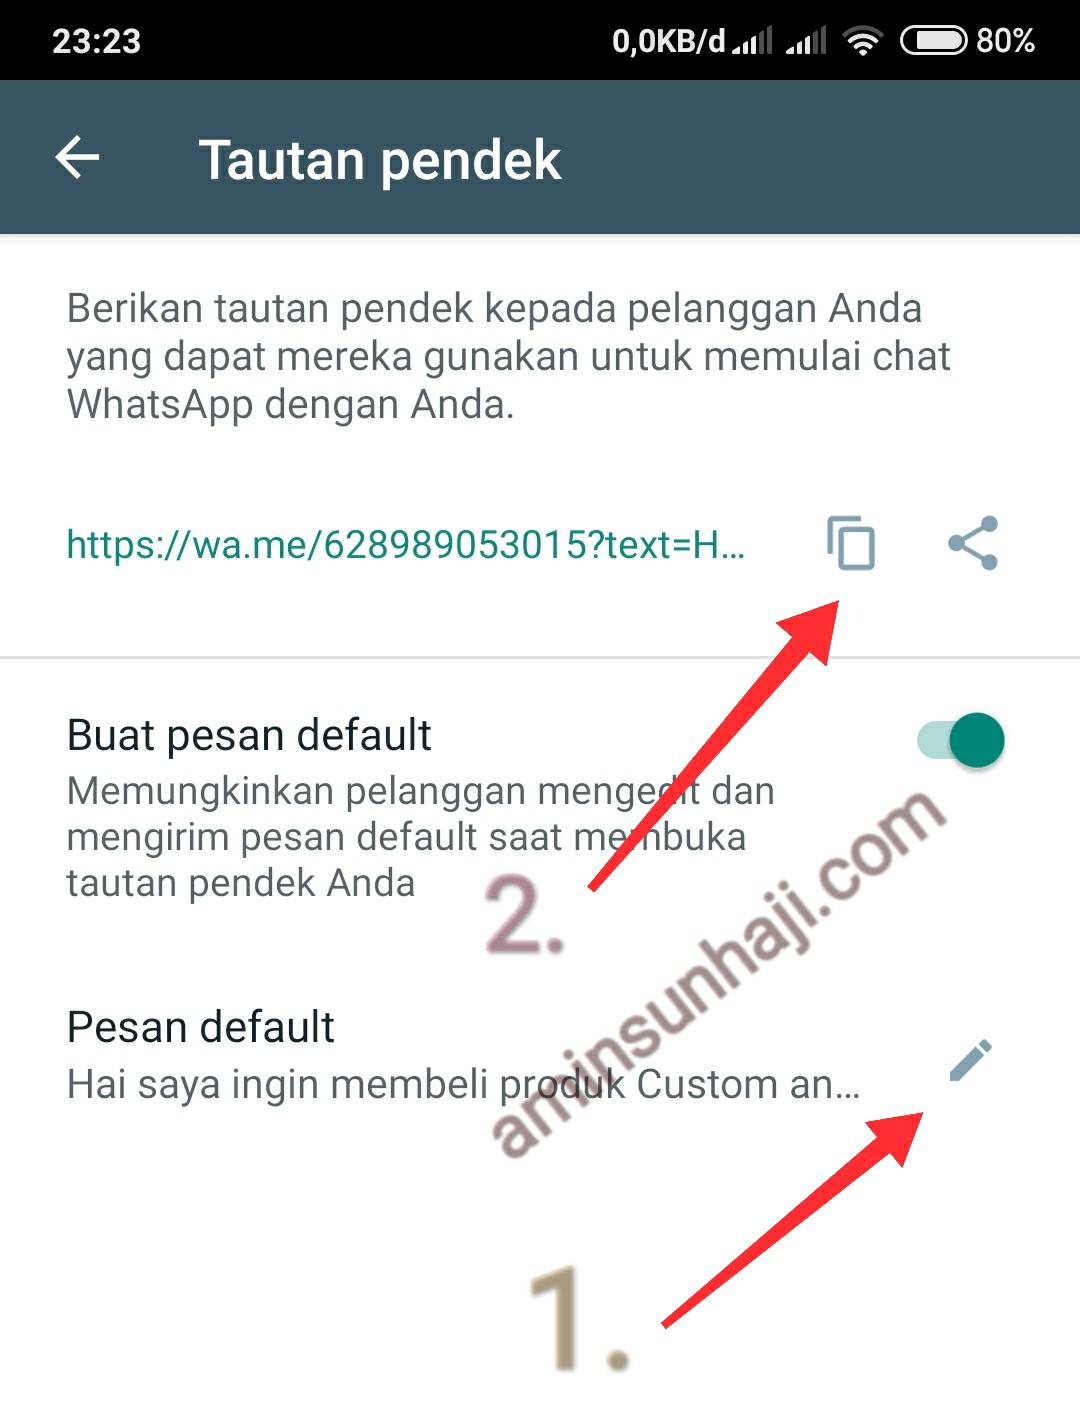 teks percakapan whatsapp, facebook, instagram, twetter